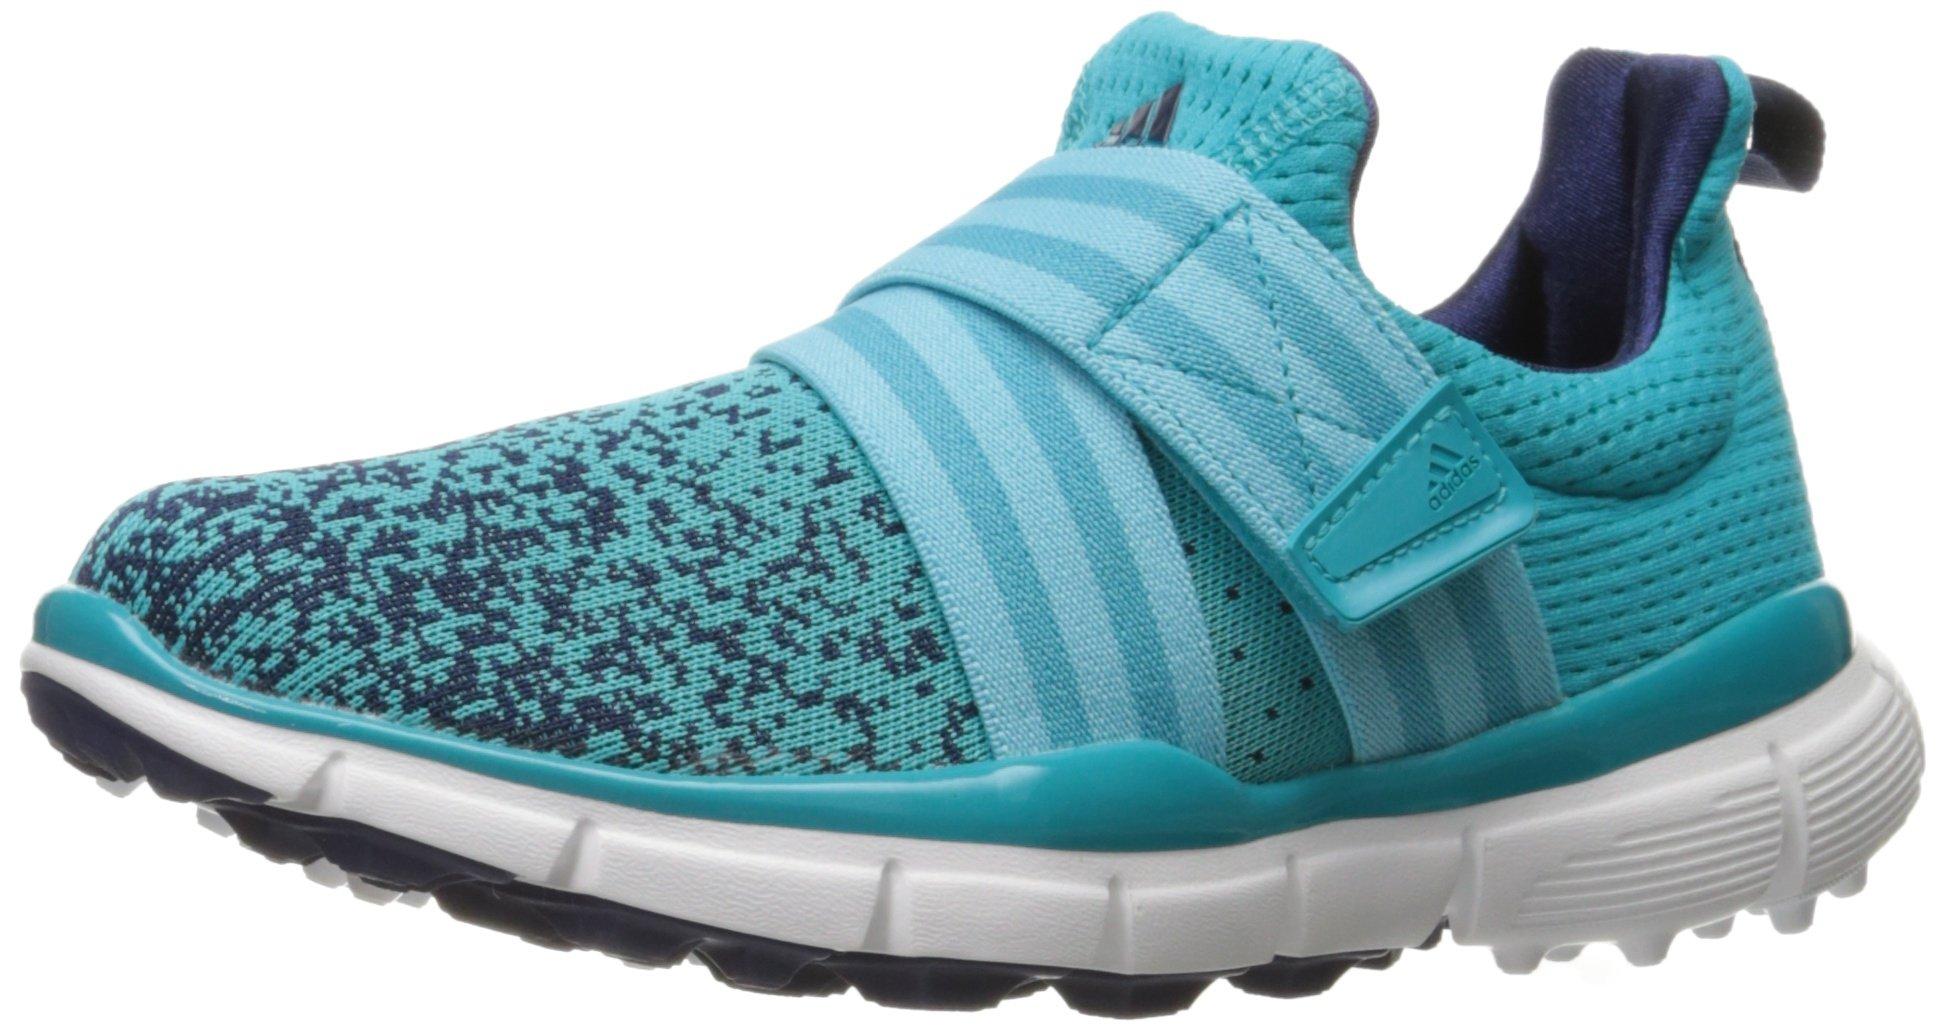 adidas Women's Climacool Knit Golf Shoe, Energy Blue, 6 M US